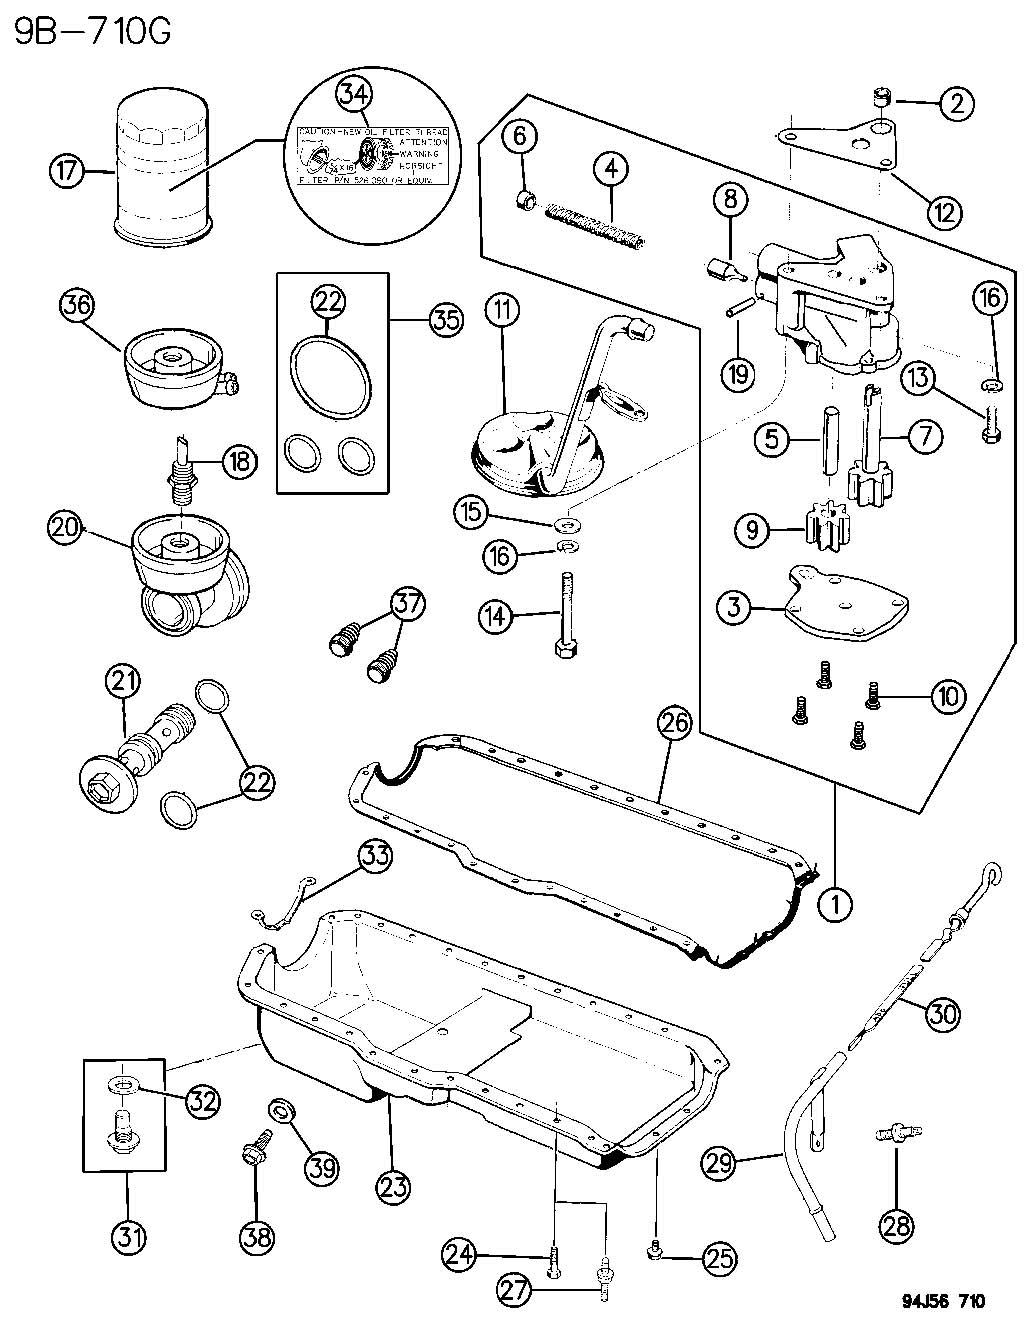 1999 Jeep Cherokee Adapter. Oil filter. Adapter, oil